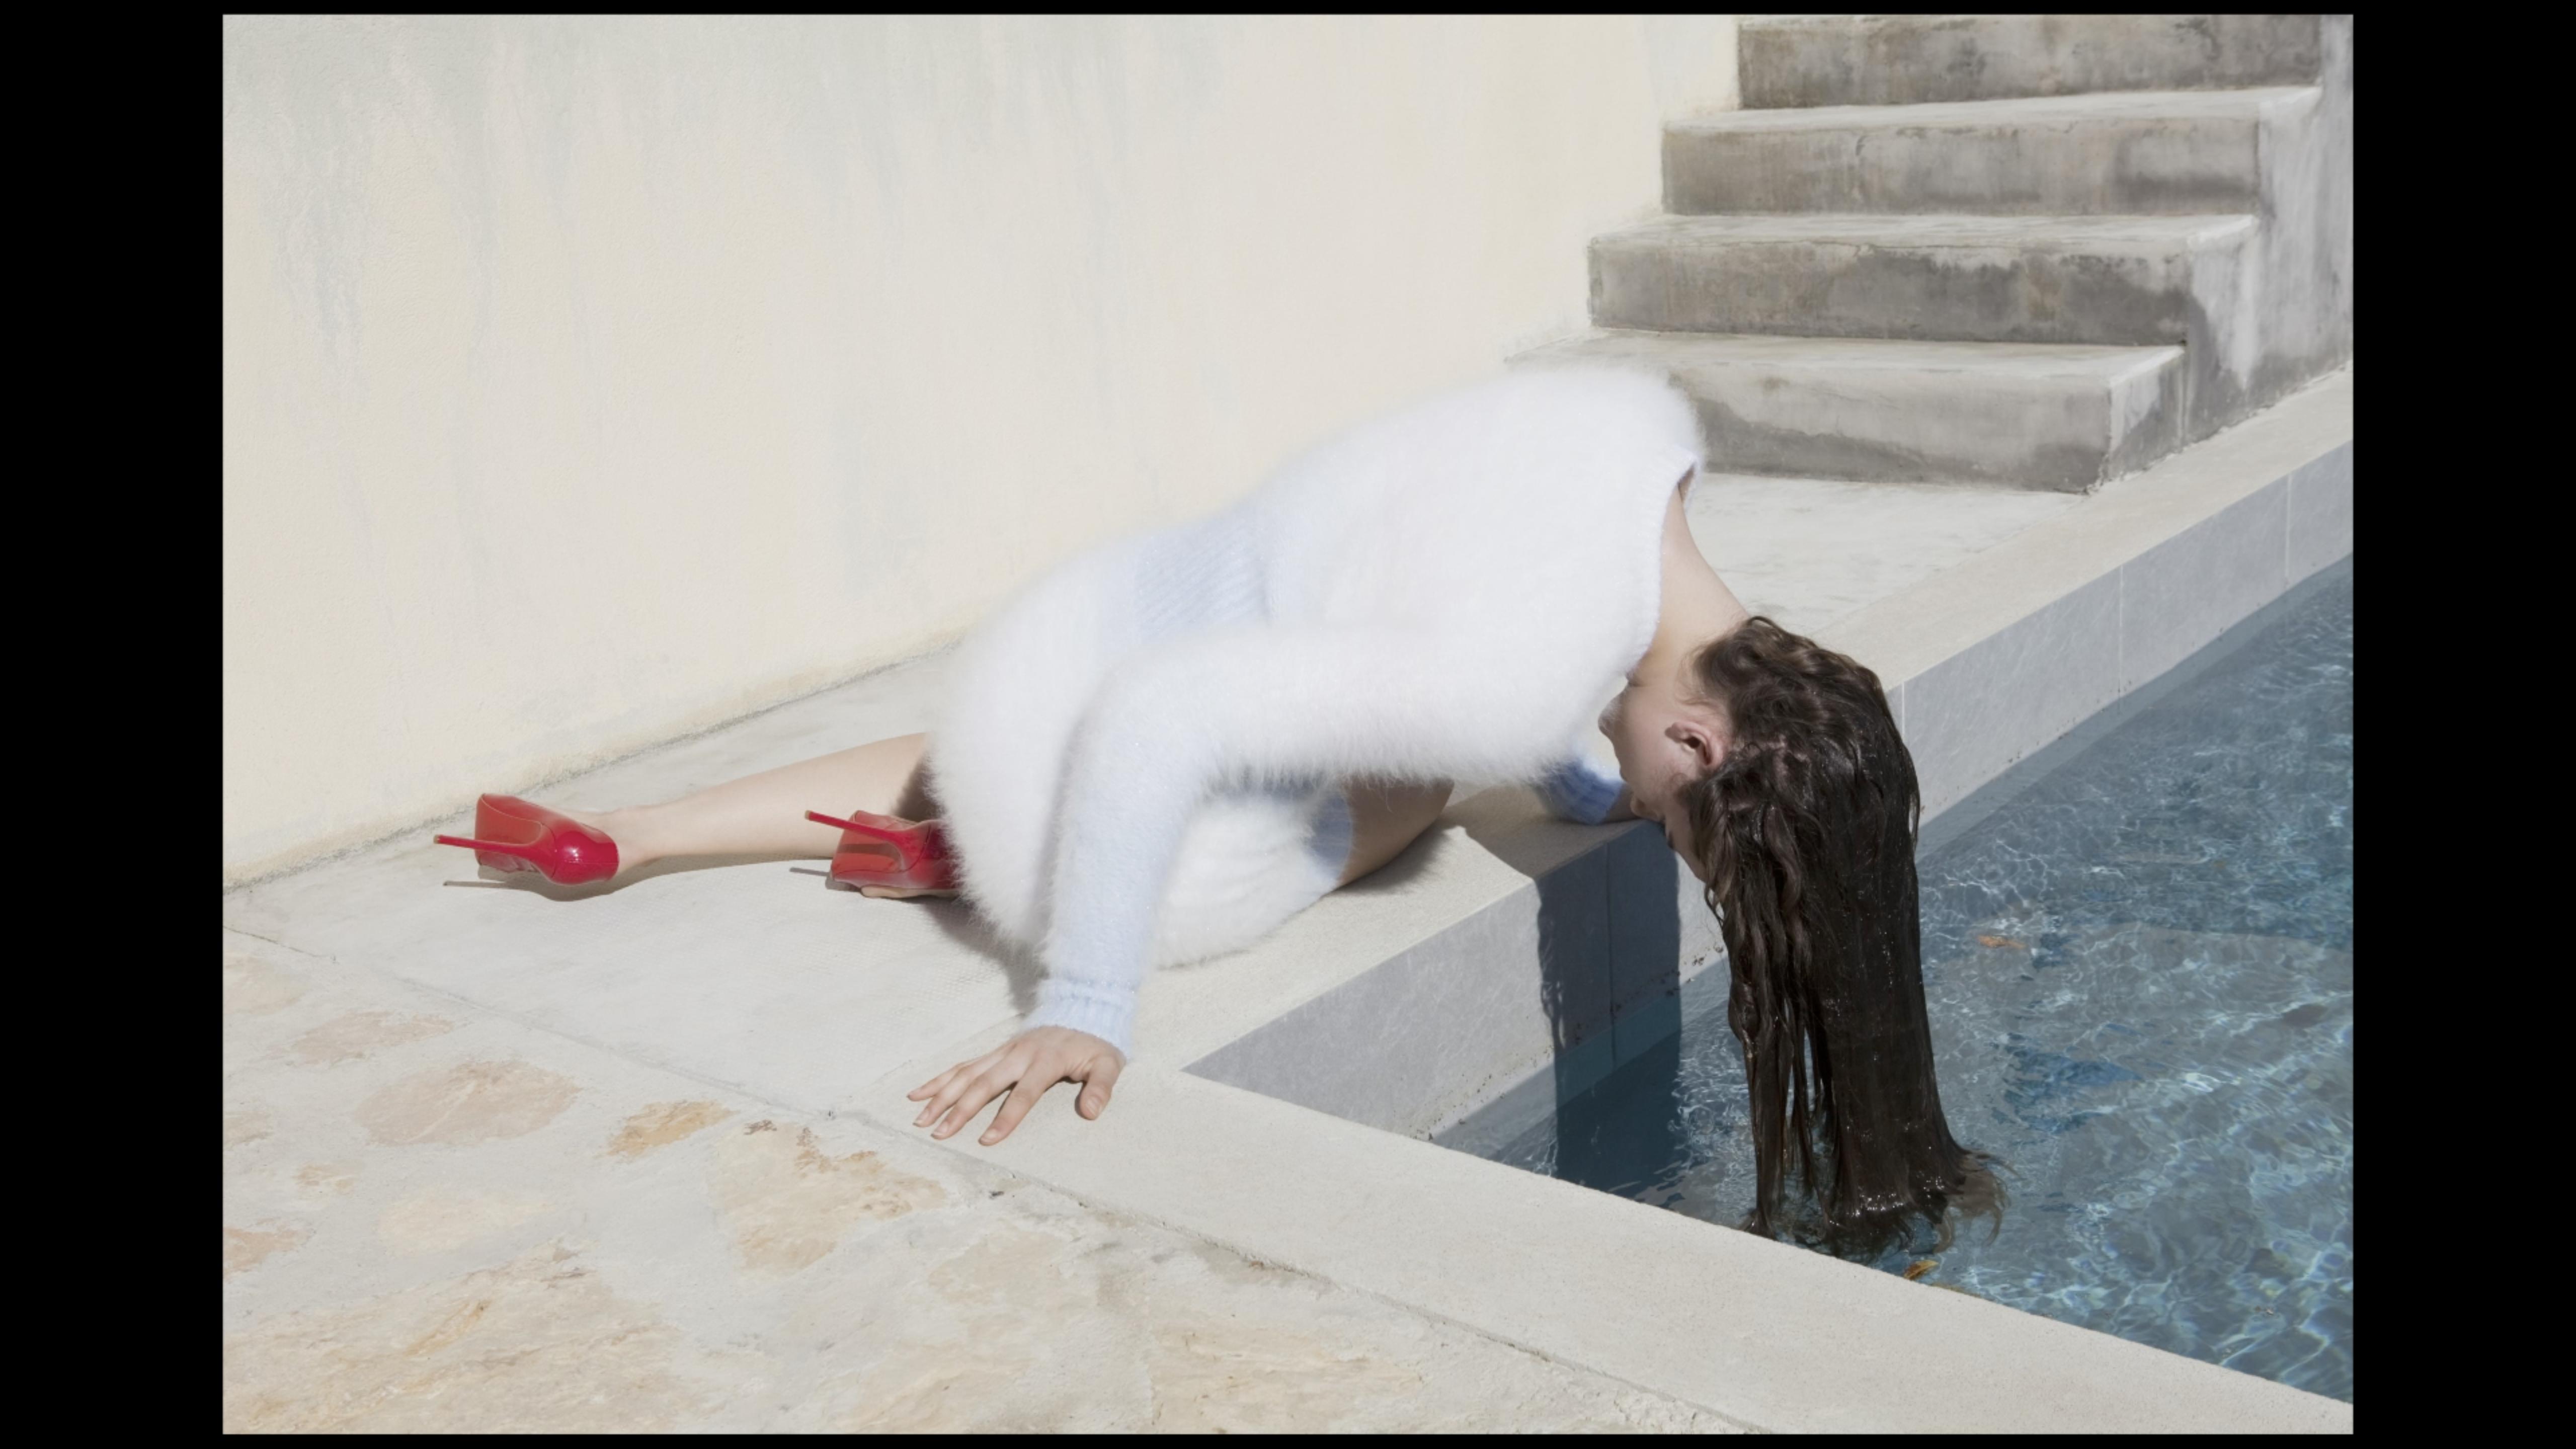 Photographers in Focus: Viviane Sassen